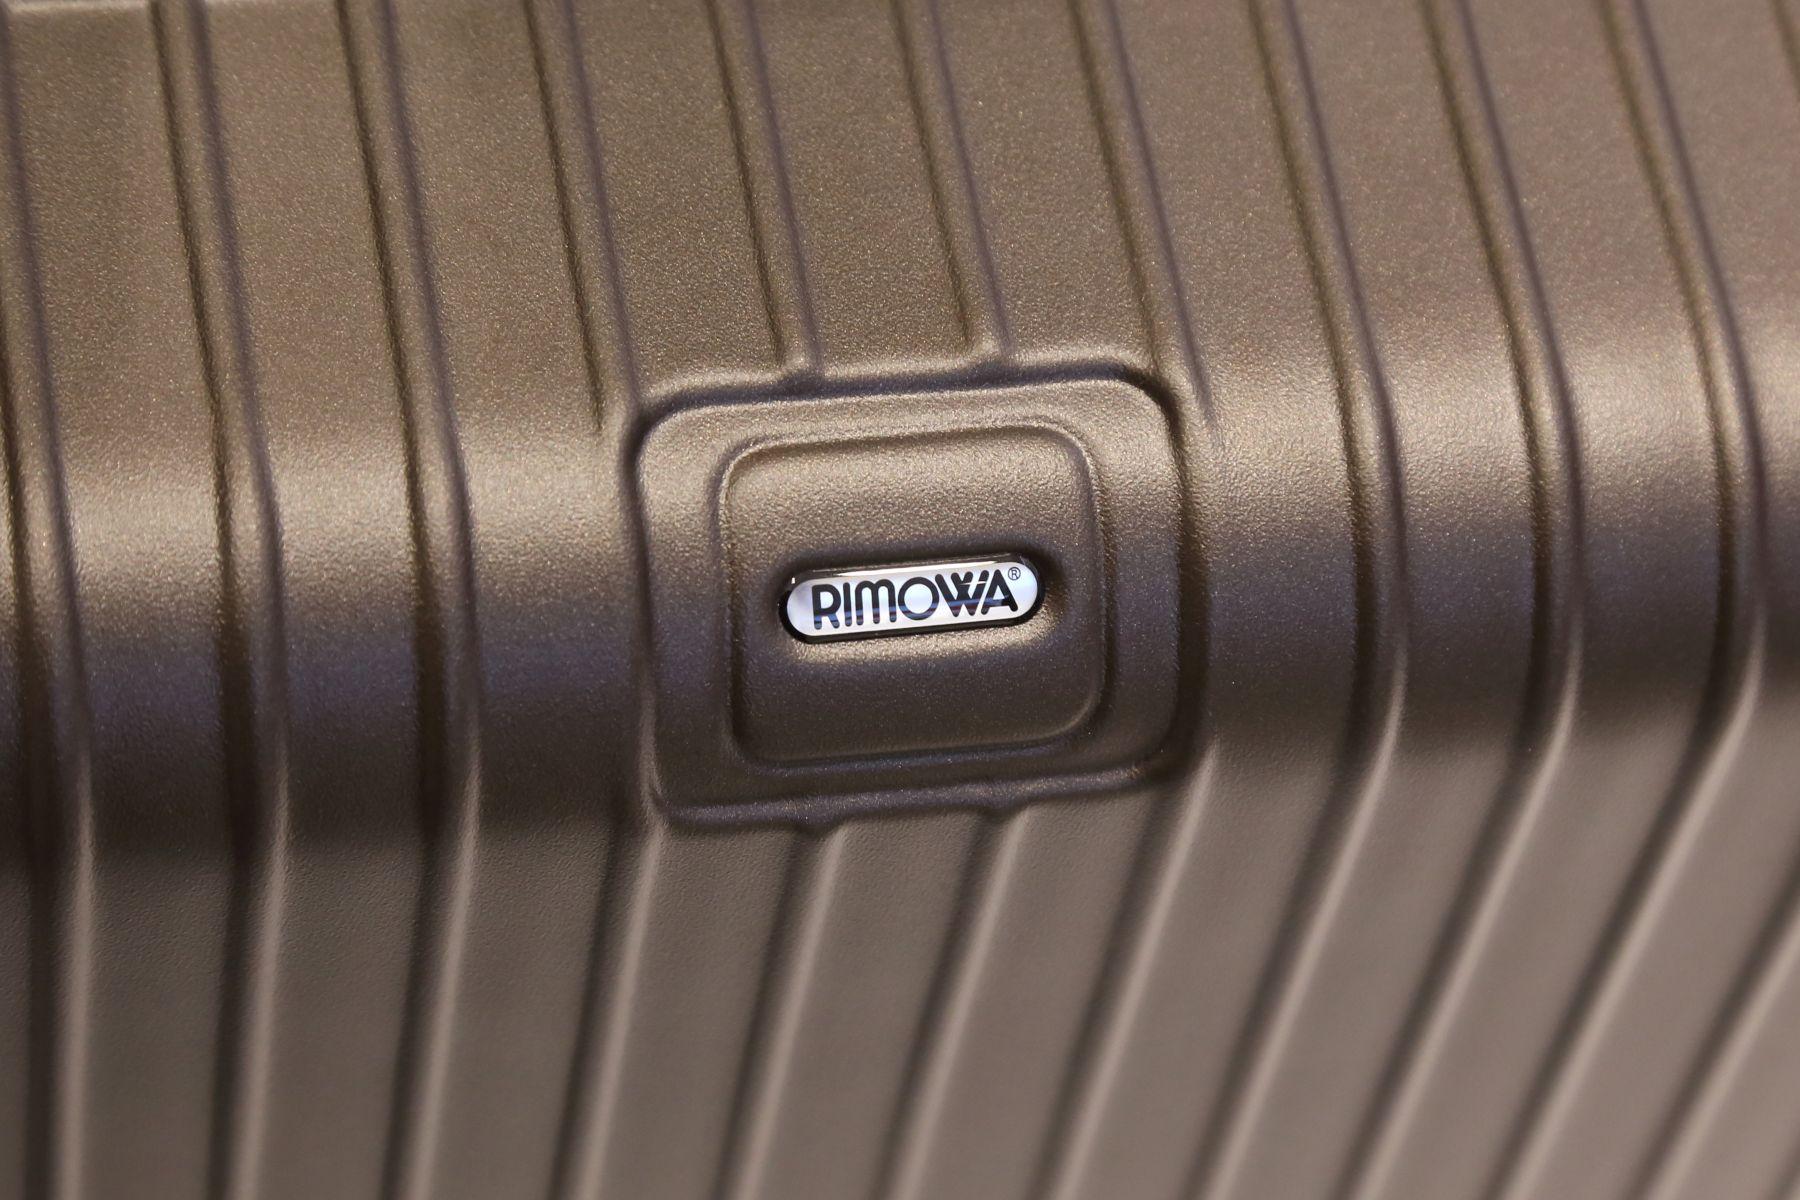 RIMOWA德國原廠不供貨 代理商:全台門市將逐步歇業